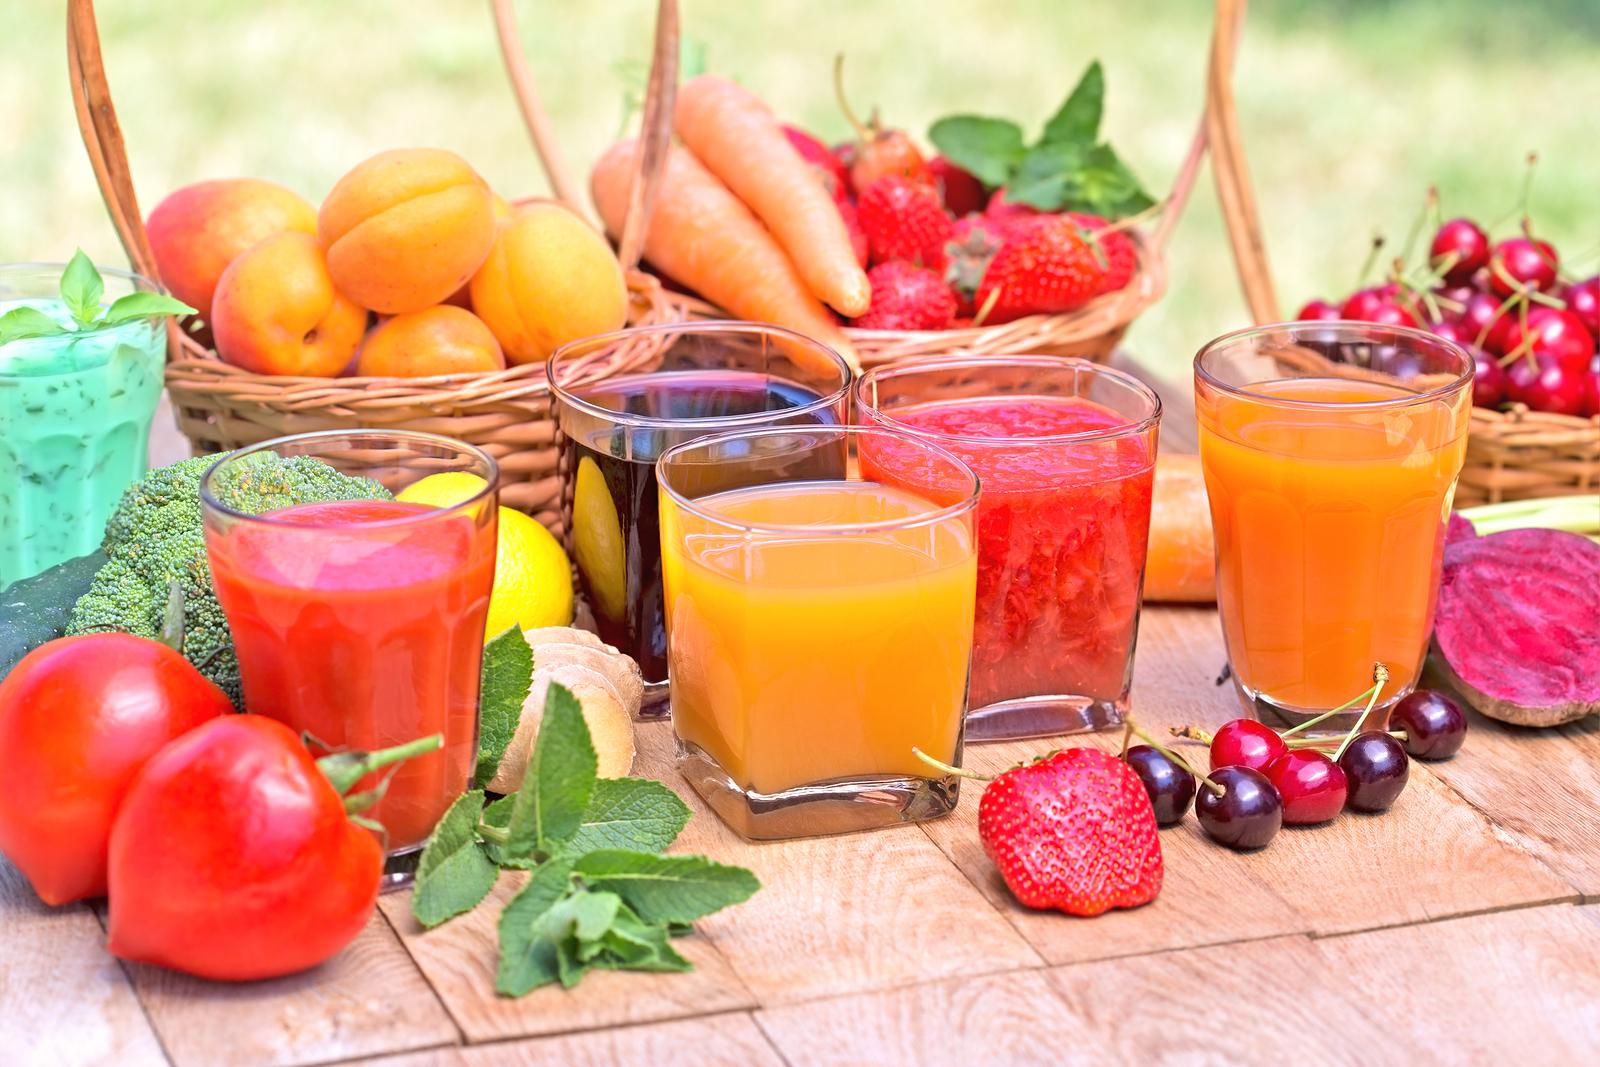 Fruit juice and vegetable juice